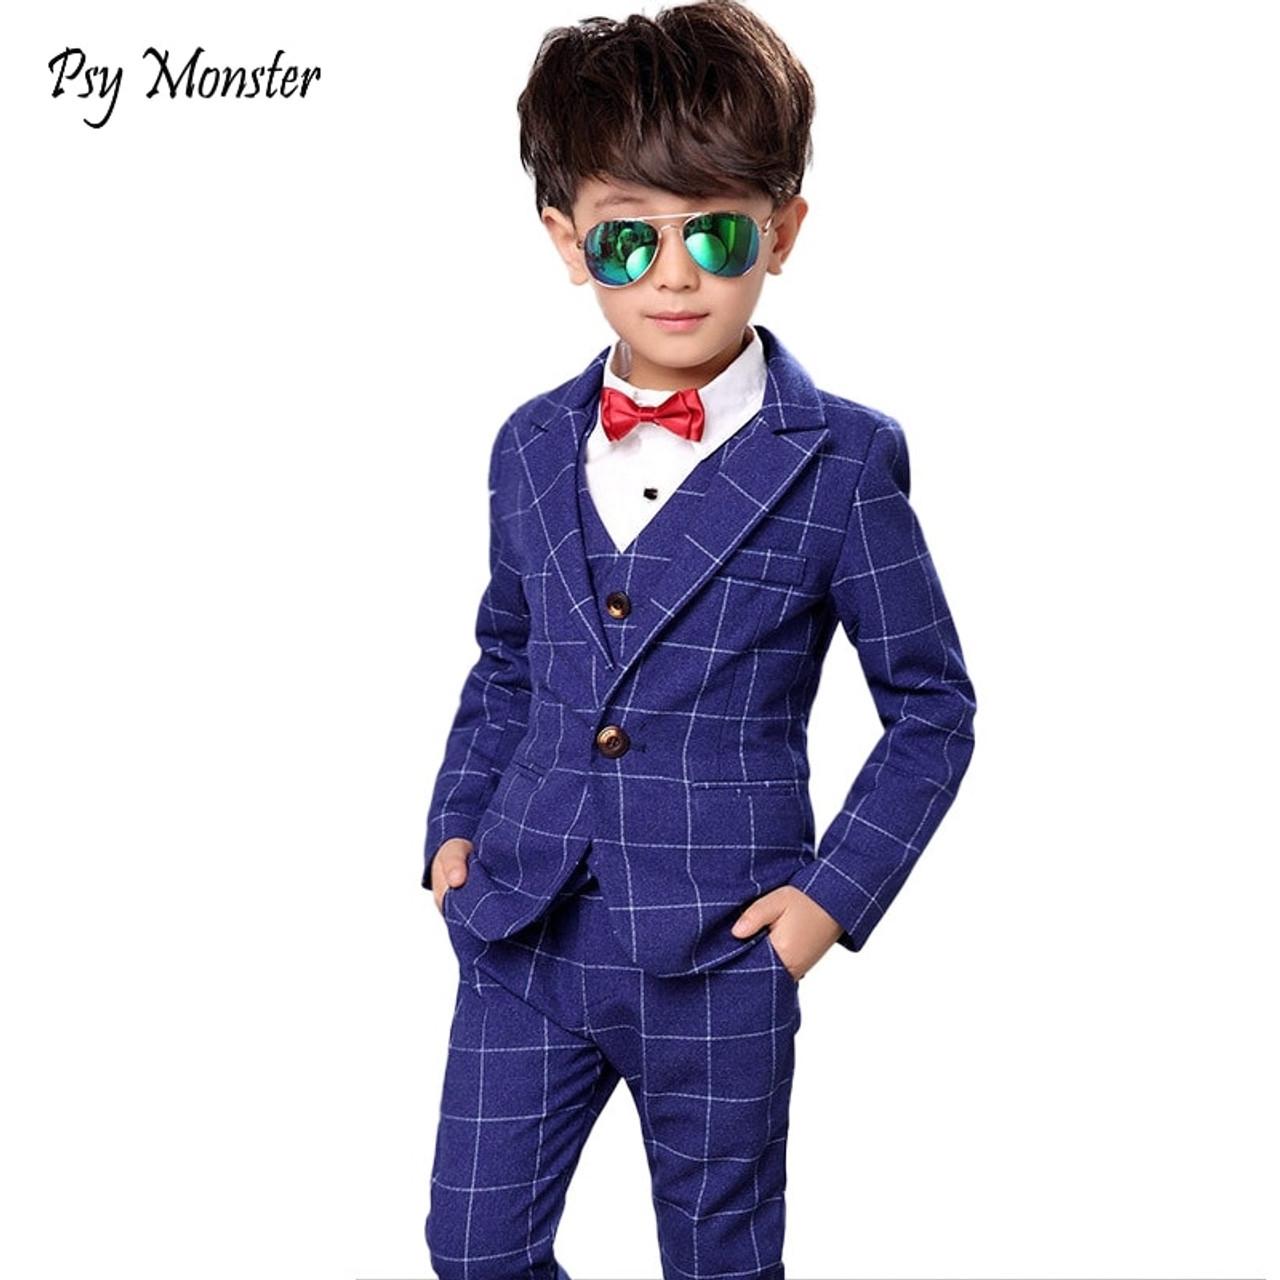 071b2667e77c6 Flower Boys Formal Anzug Suit Kids Wedding Birthday Party Dress Blazer Vest  Pants 3pcs Child Tuxedo Prom Performance Costume N40